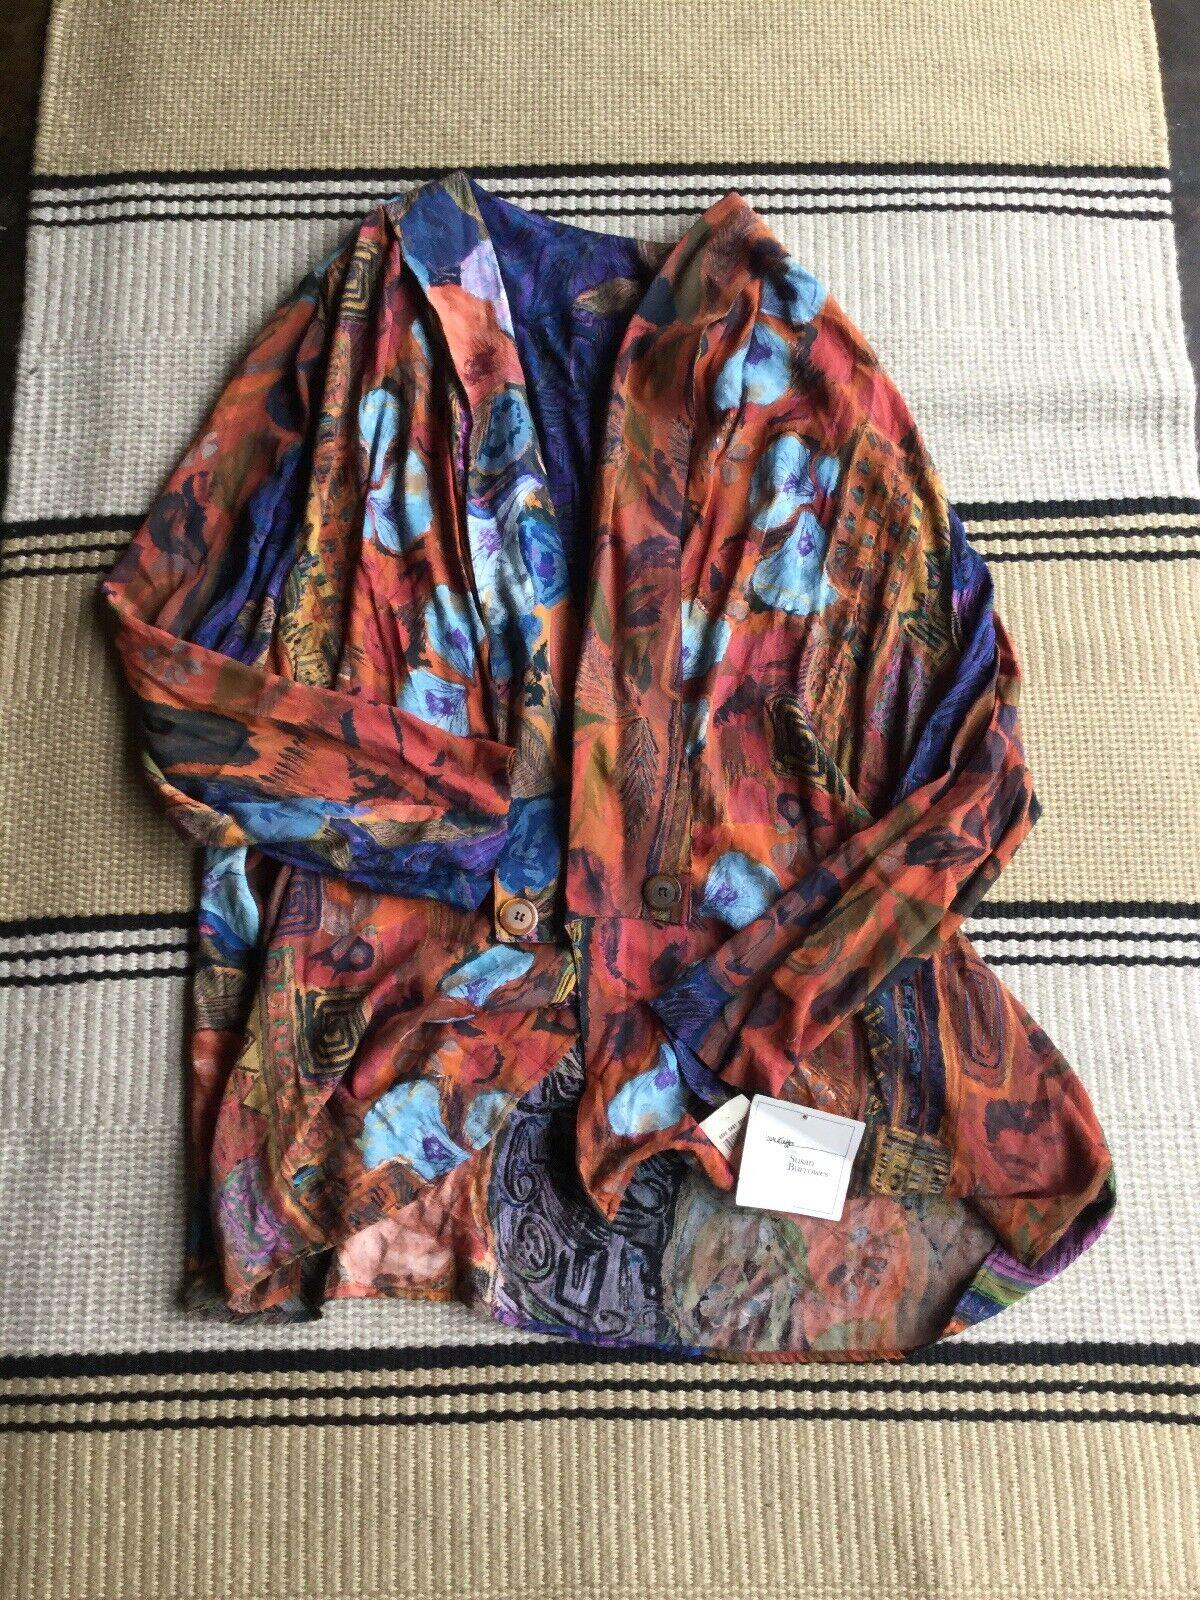 Vintage Laura Kieffer Susan Burrowes Nuevo  con etiquetas para mujer largo Boho Kimono azulsa Talla 24 EE. UU.  la mejor oferta de tienda online